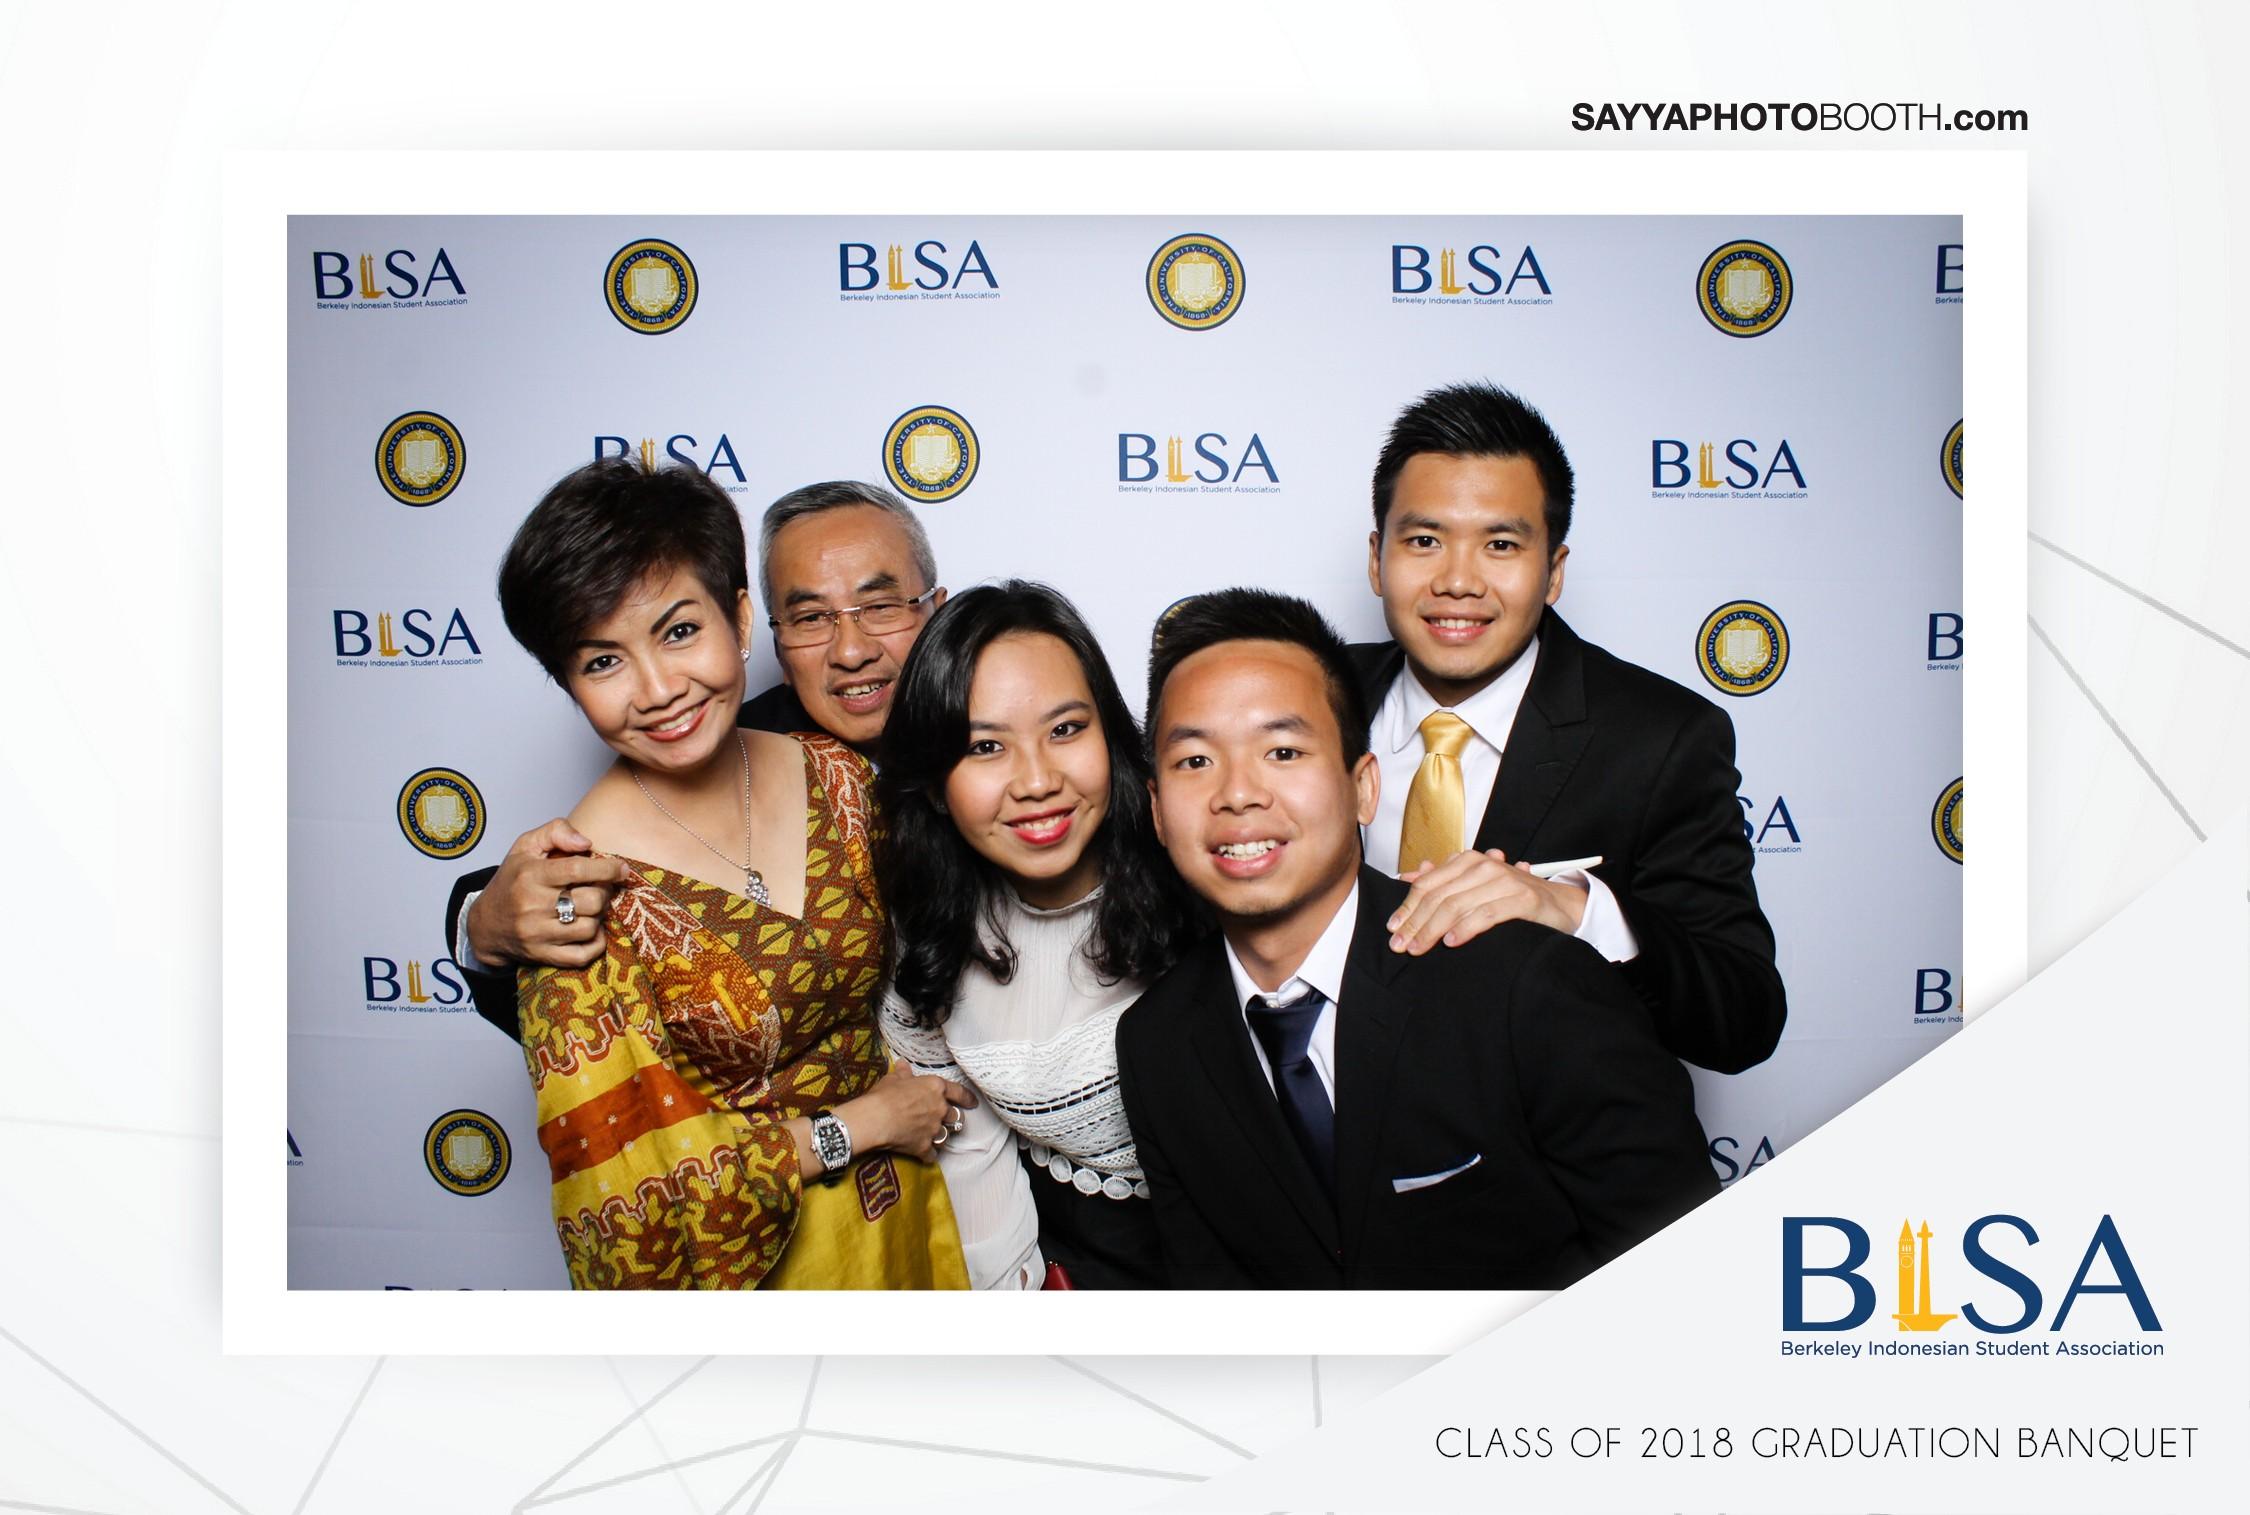 BISA Graduation Banquet